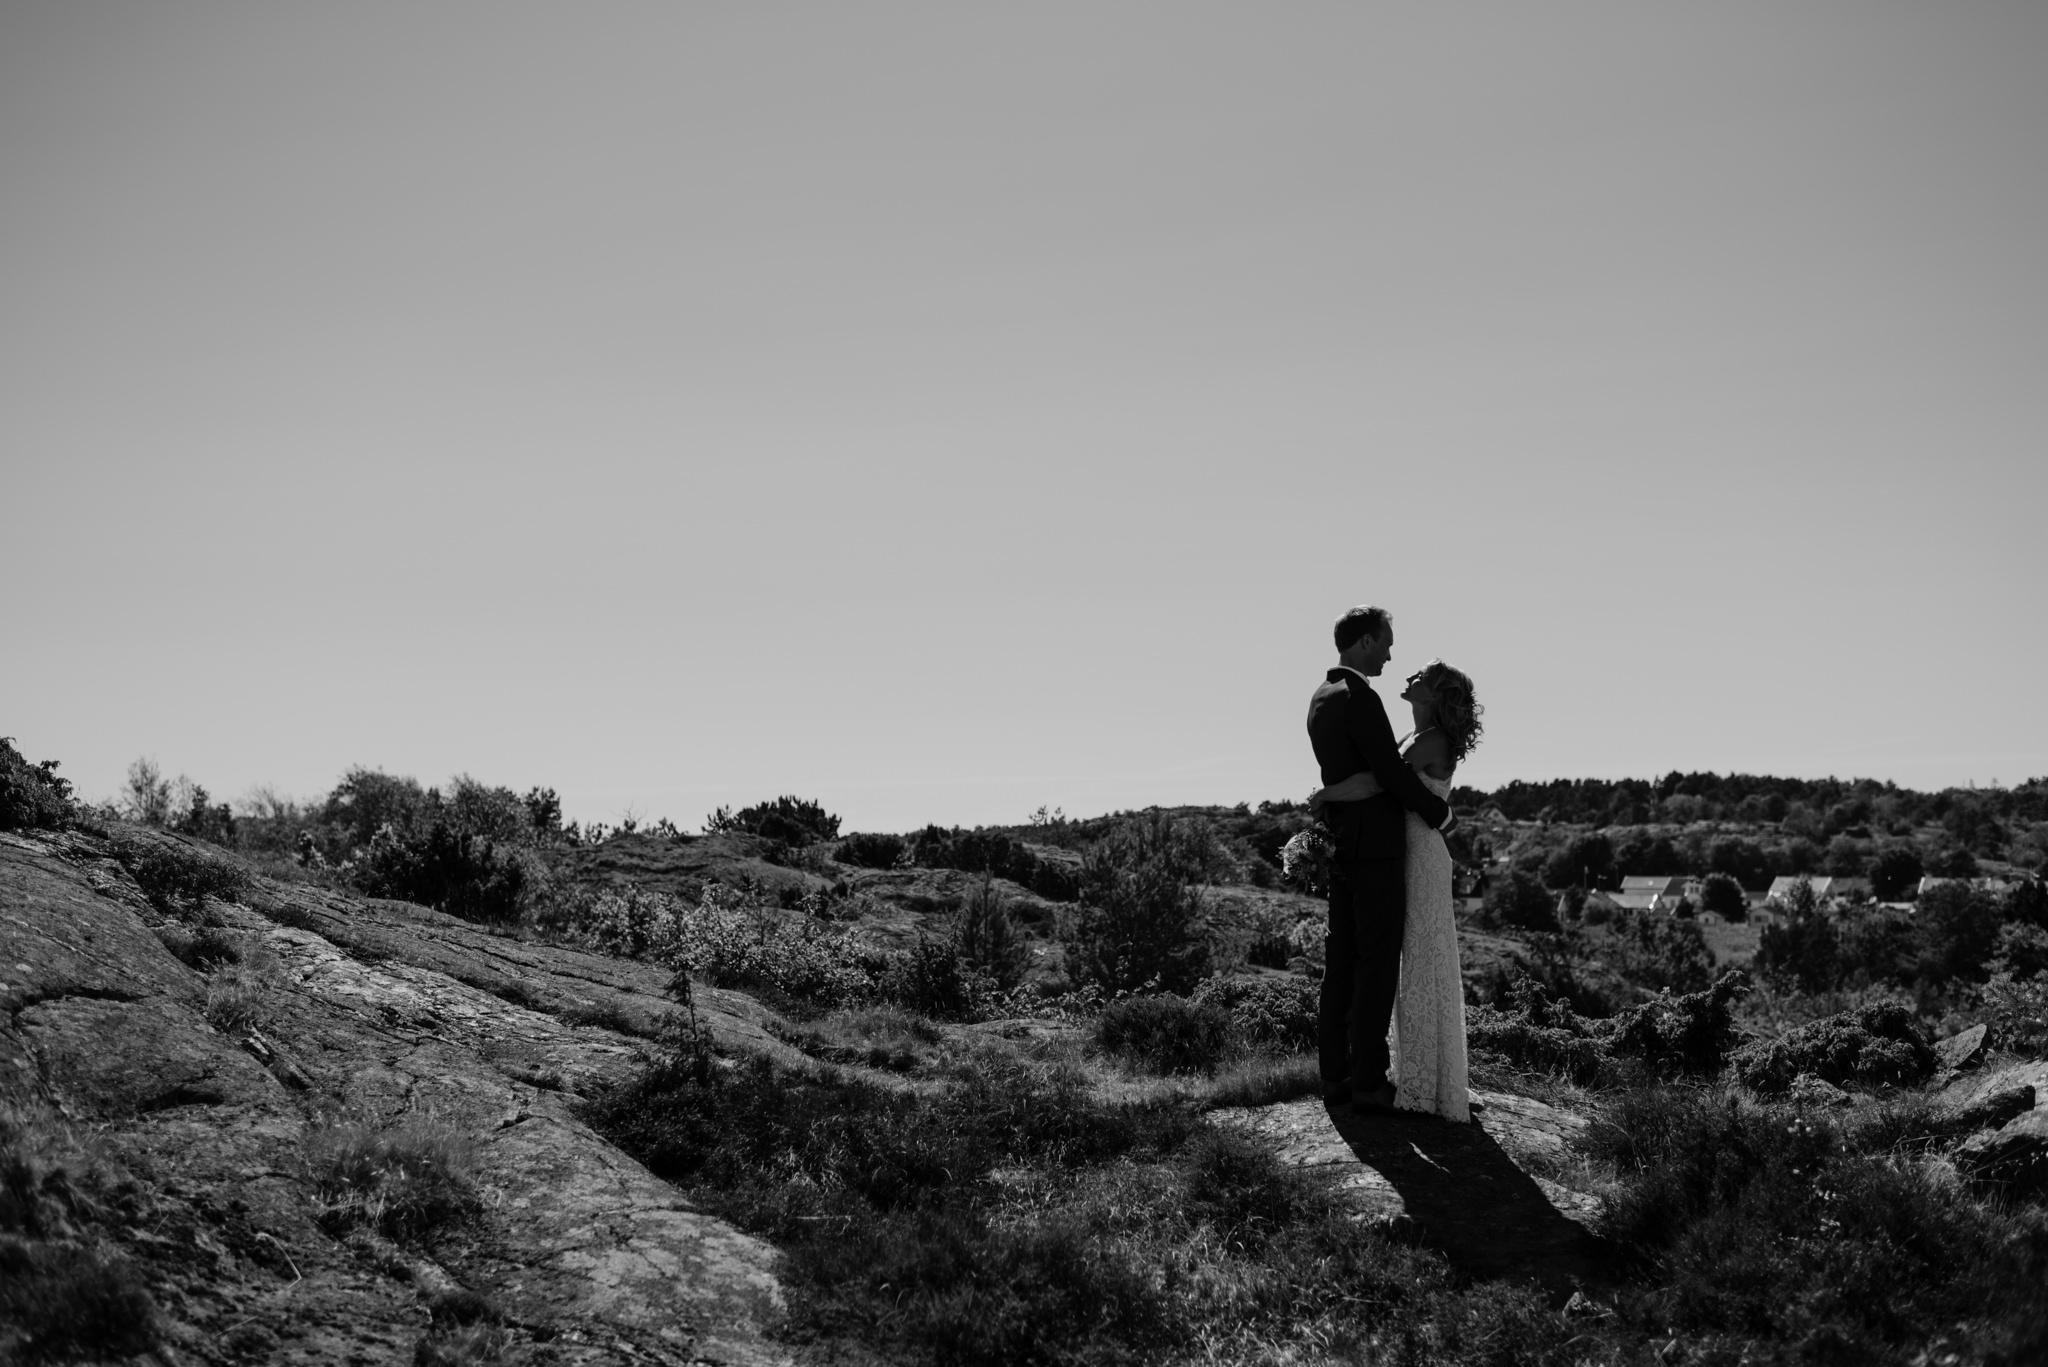 skargardsbrollop-goteborg-koster-sydkoster-00010.jpg